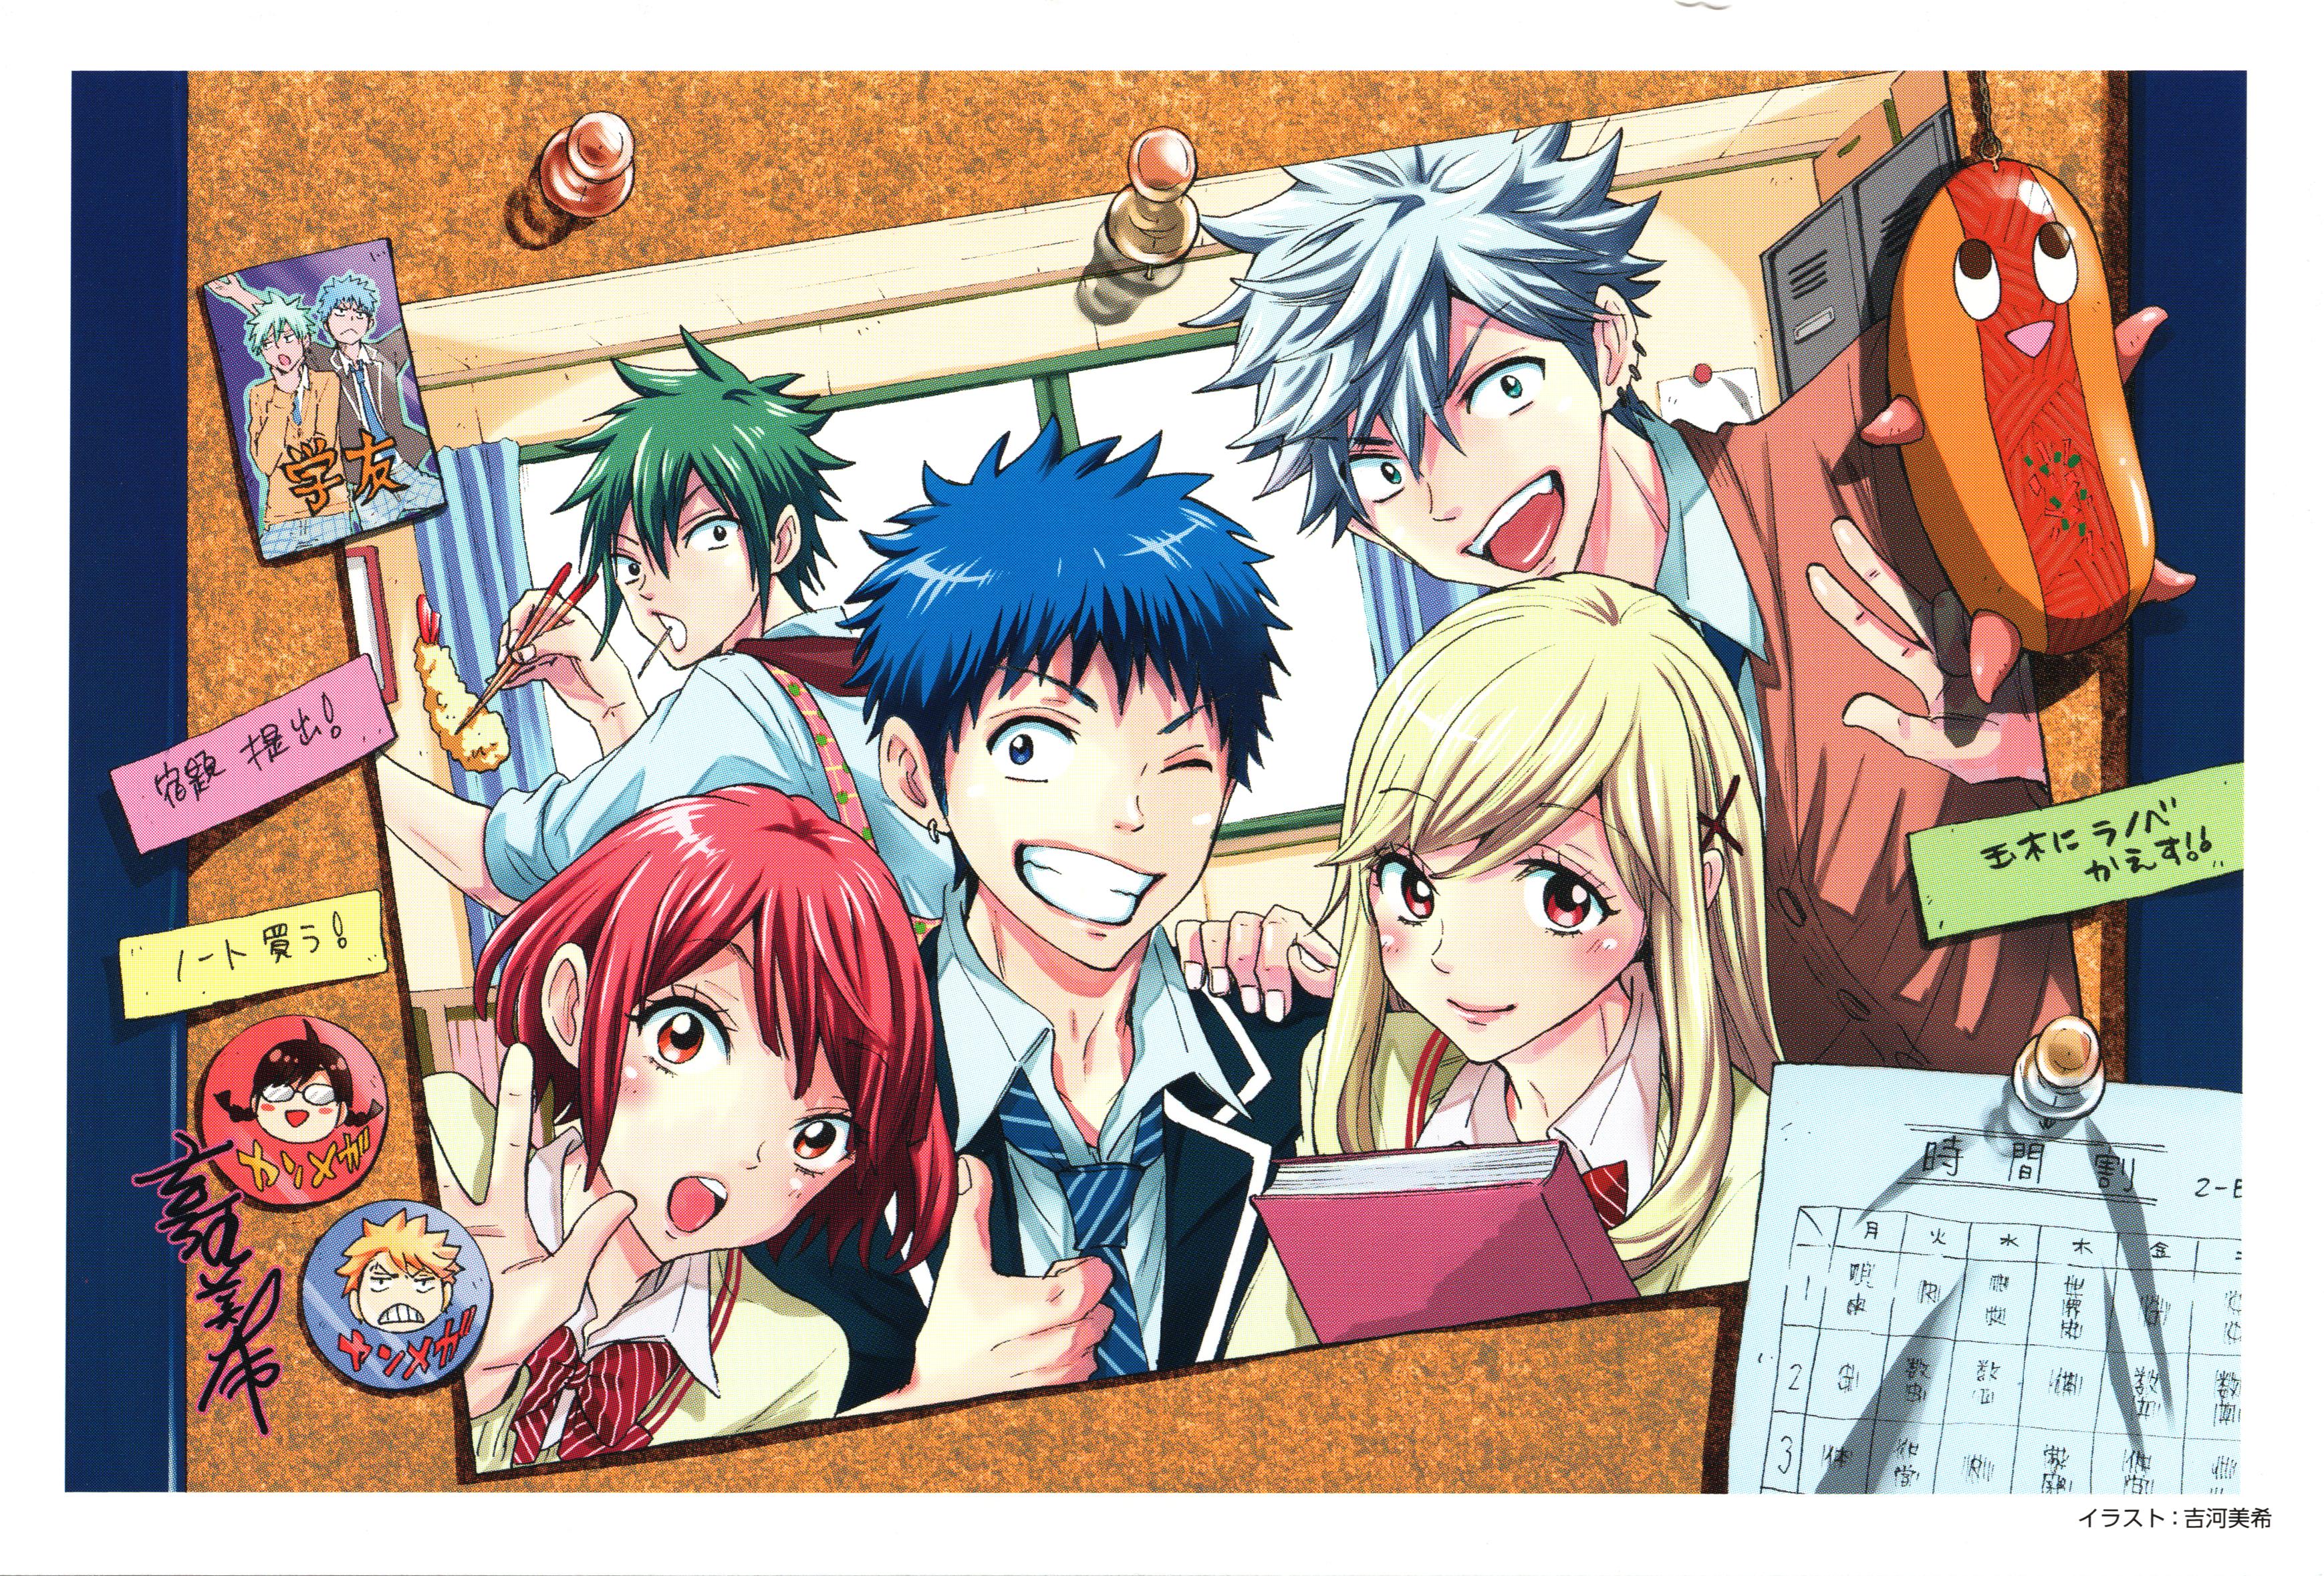 Yamada Kun To 7 Nin No Majo Zerochan Anime Image Board